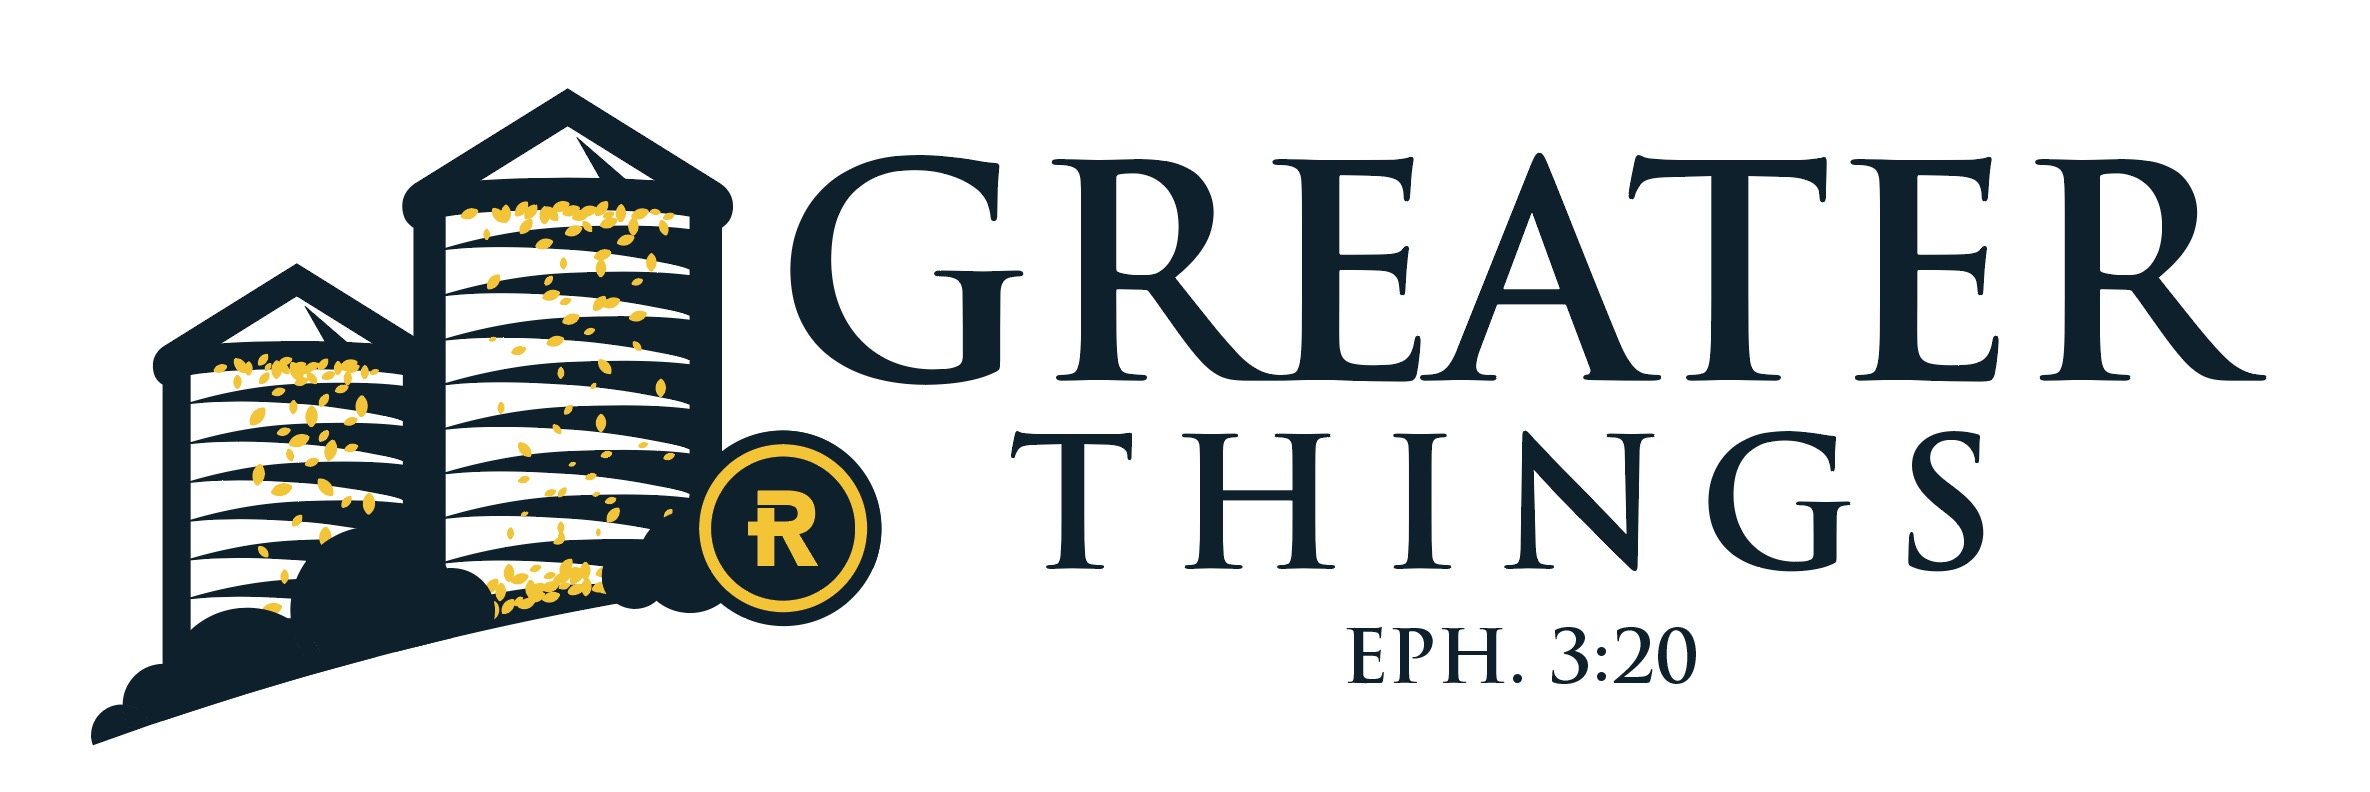 Advance Commitment Gathering #3 logo